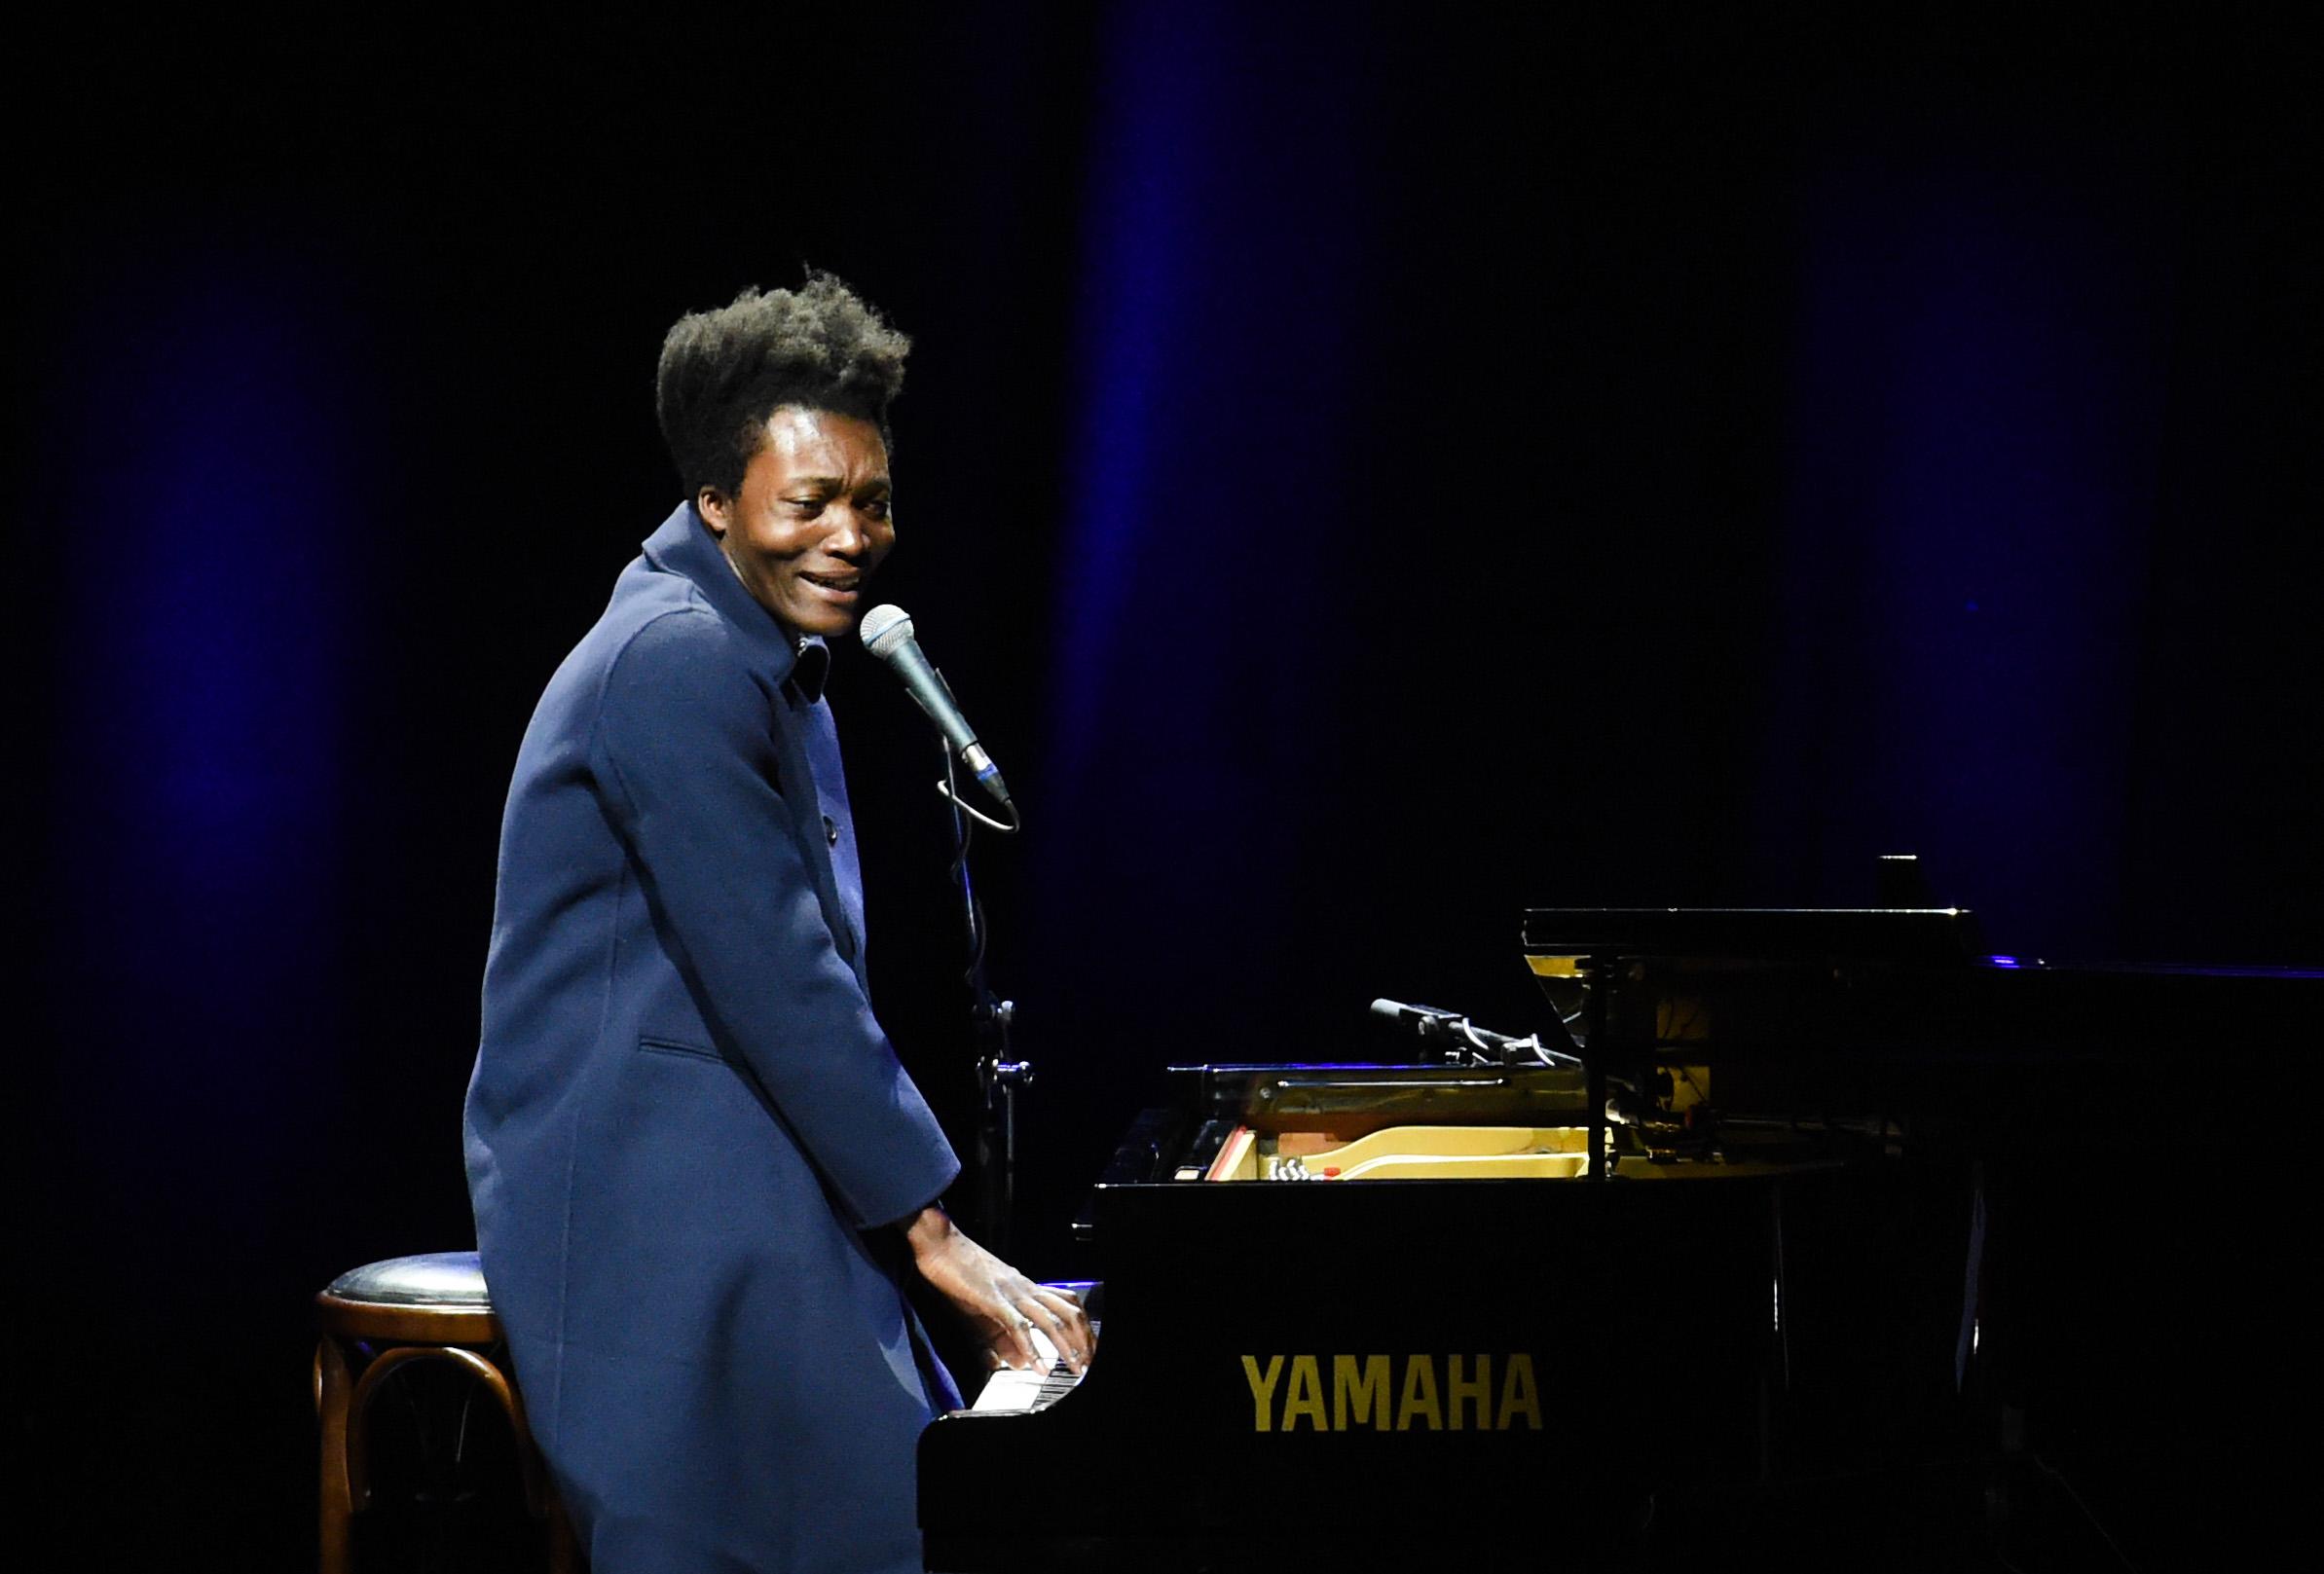 Benjamin Clementine koncertas Lietuvoje: per tikra ir per subtilu apibendrinti